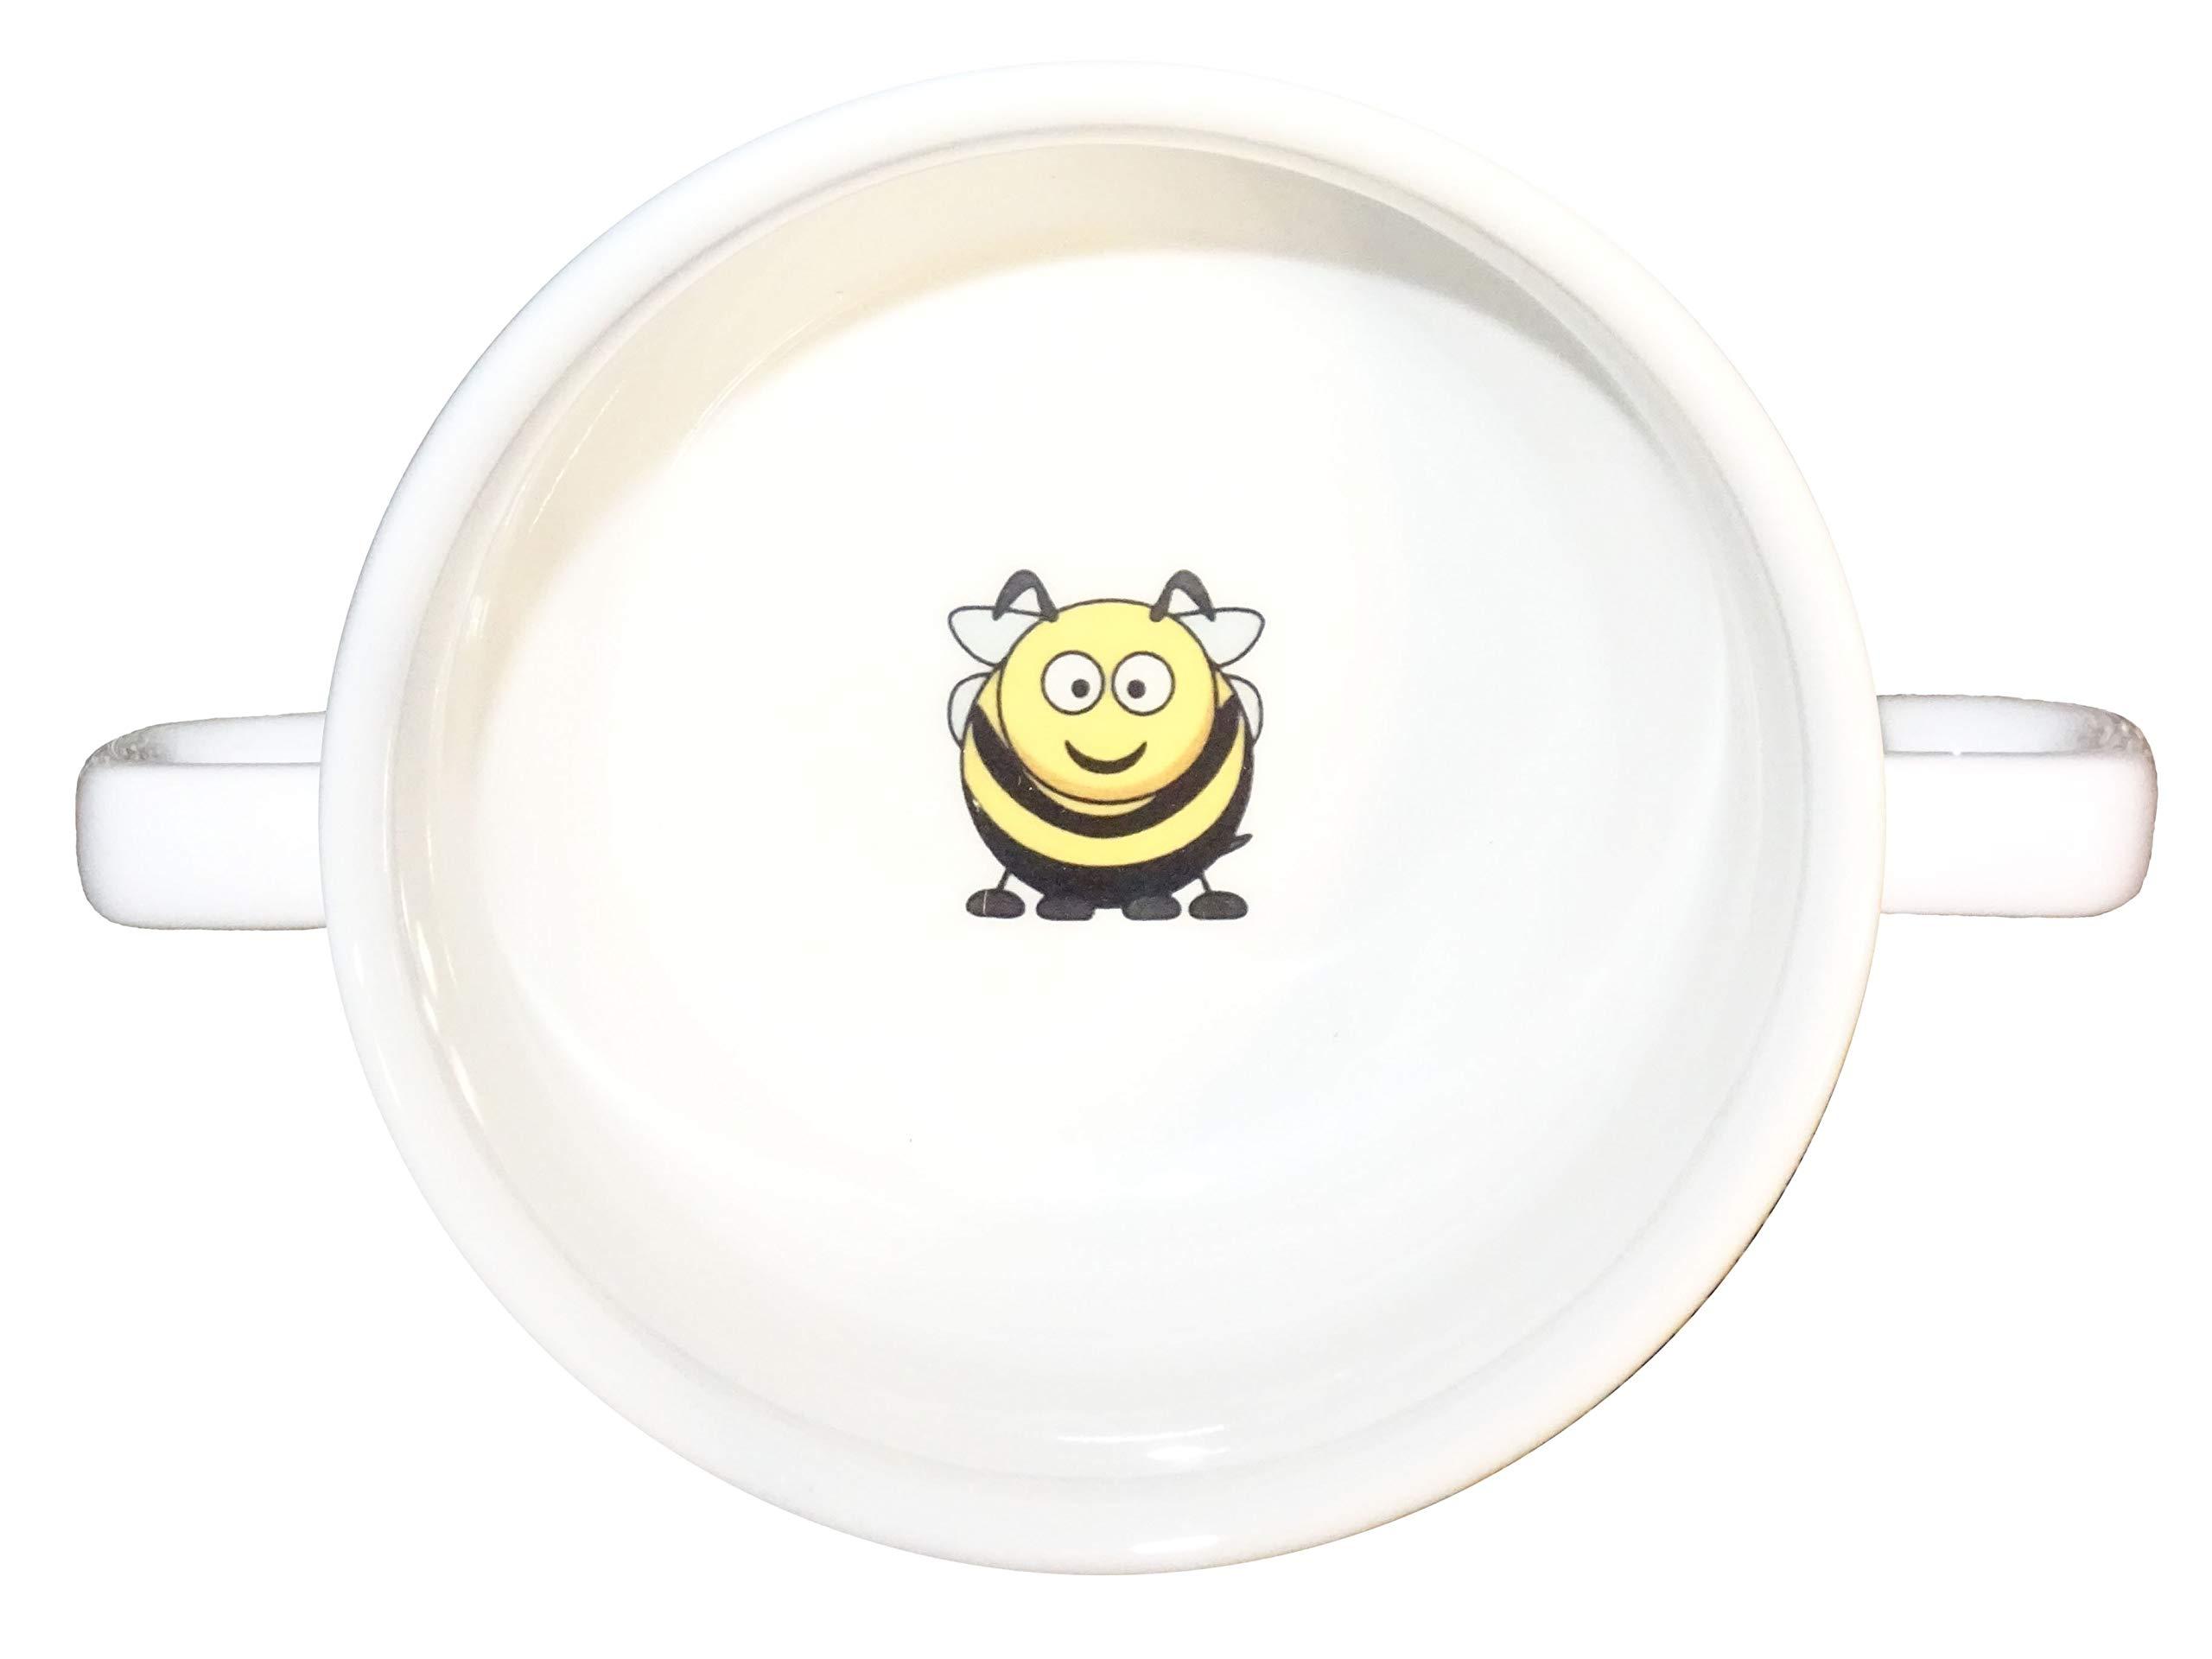 Soup Bowl 11, 1 pcs, bee Soup Bowl Small Baby Child Kids, Bottom, Hidden Message, Secret Message, Animal, Cartoon, Animal, Bi, Cartoon, Honey, Good Cartoon Drawings, Kids, Porcelain